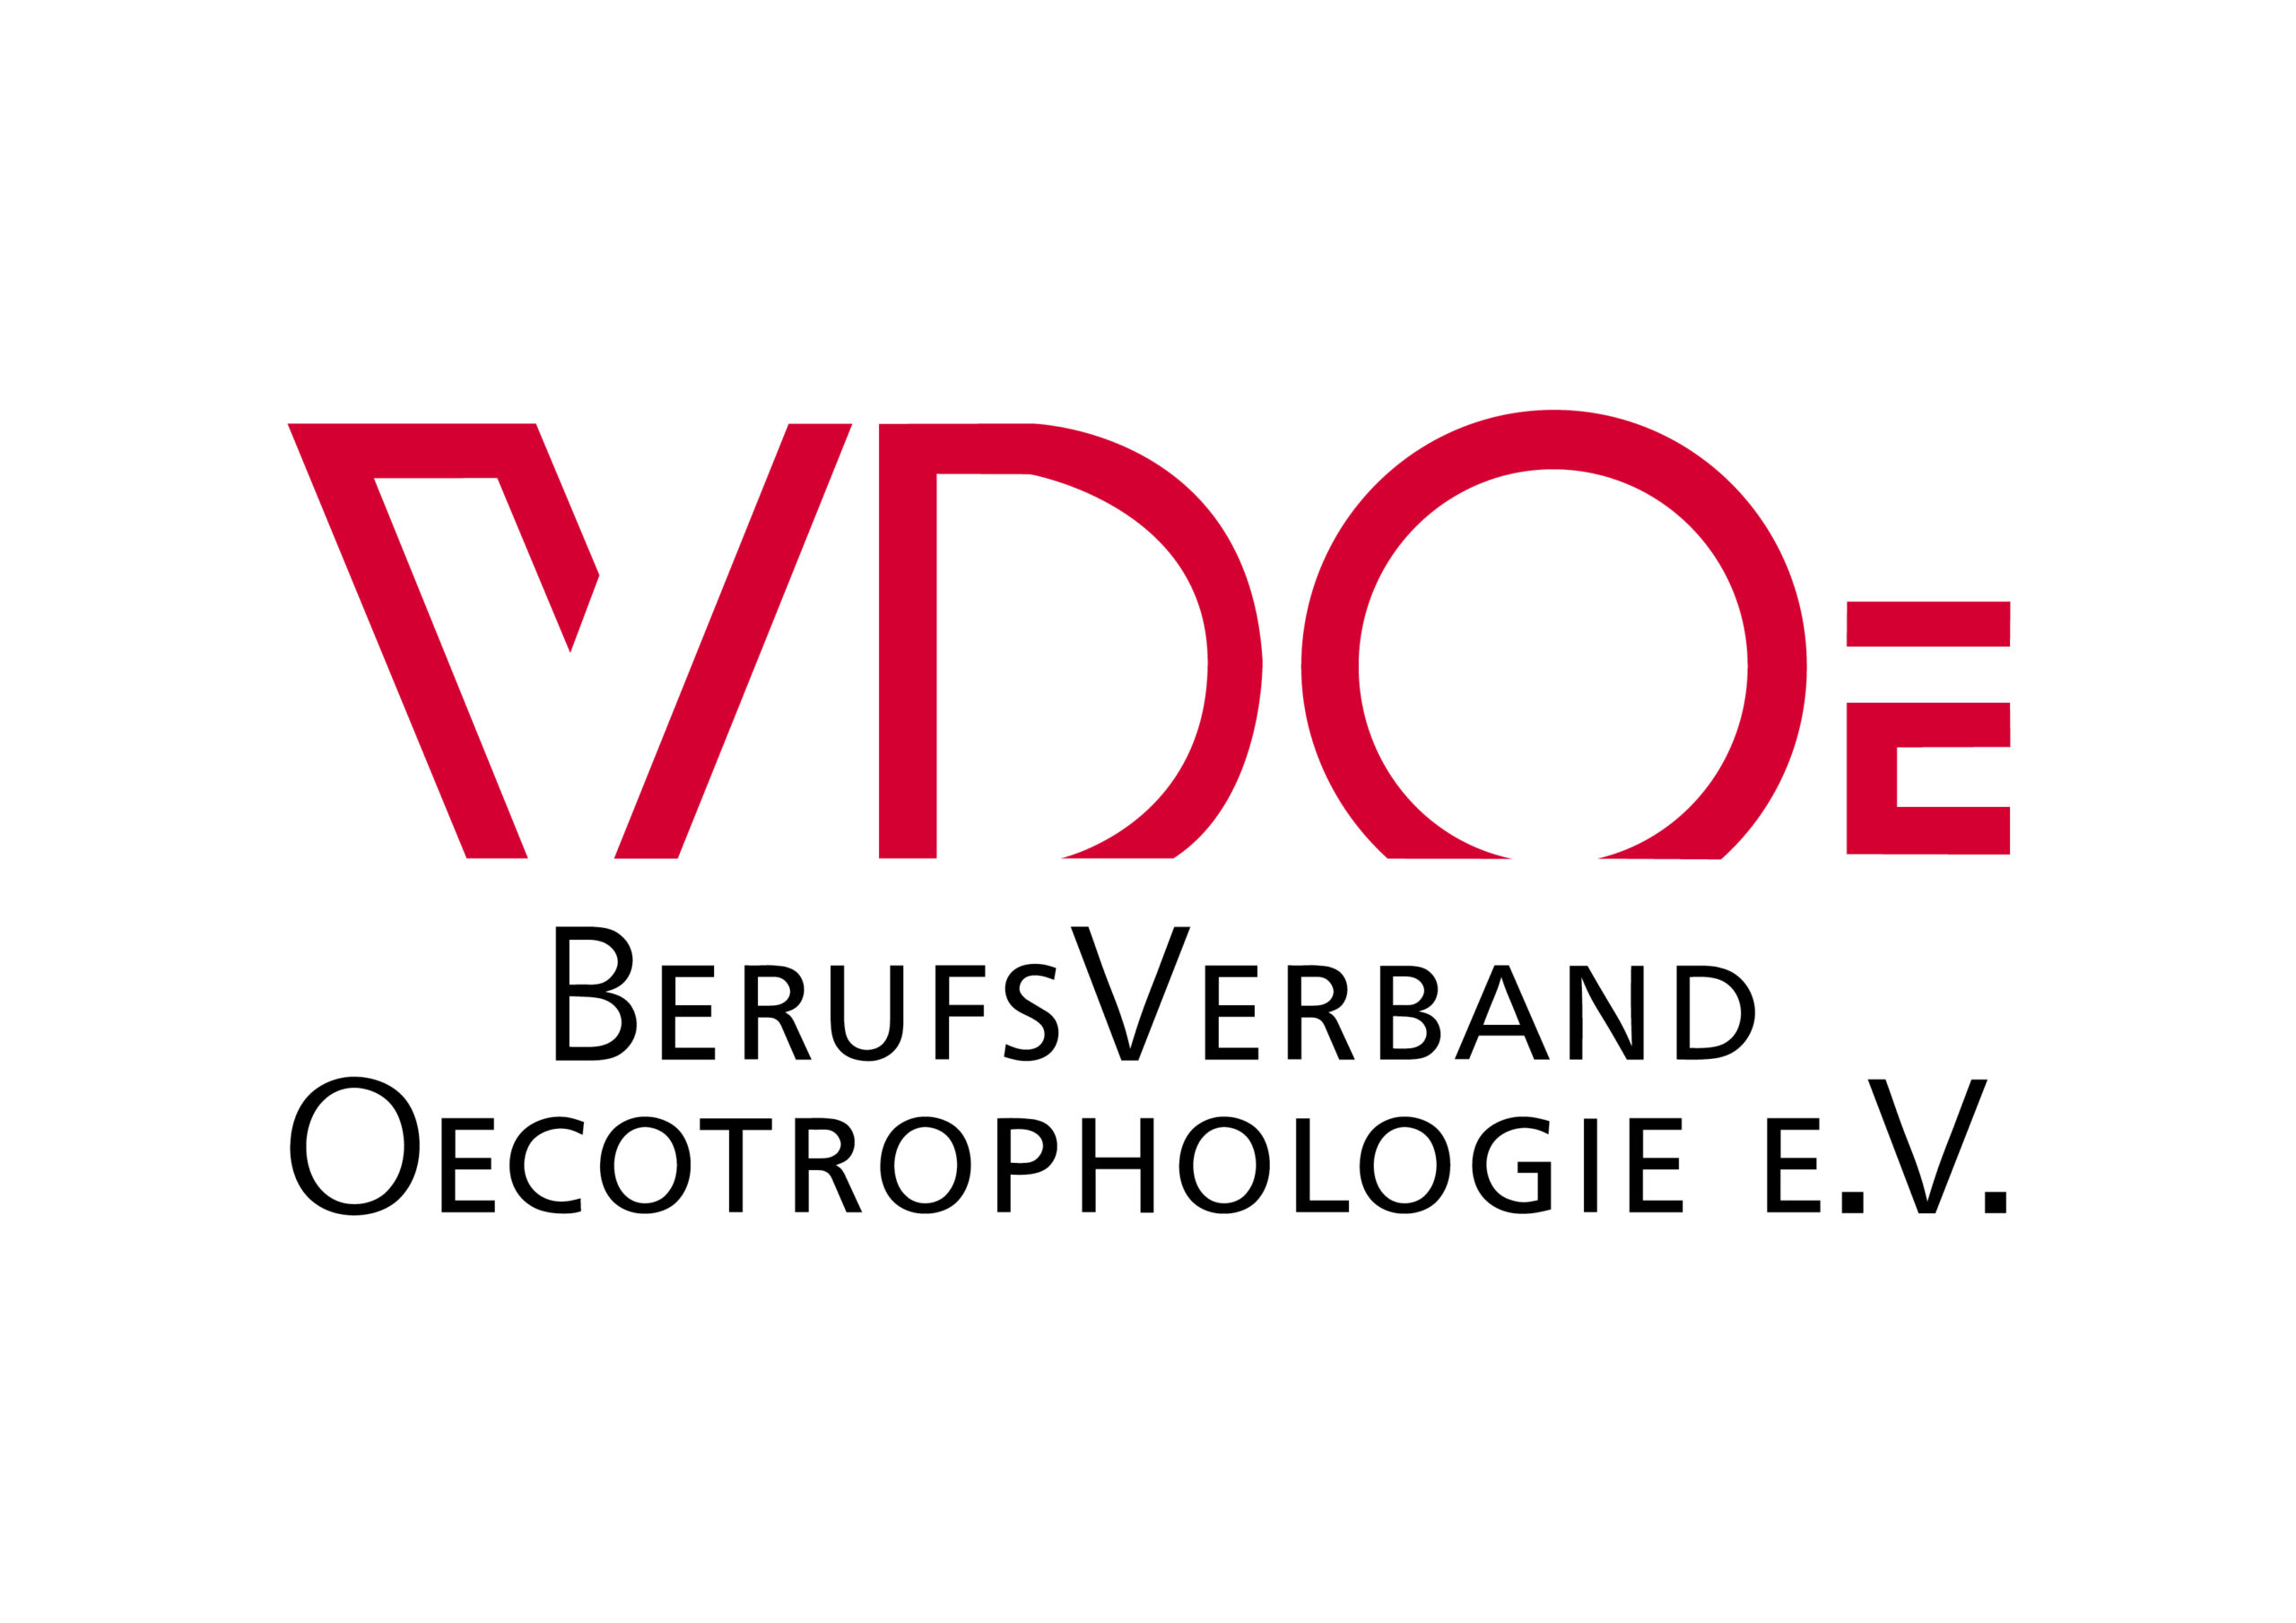 VDOE verleiht OECOTROPHICA-Preise 2020!